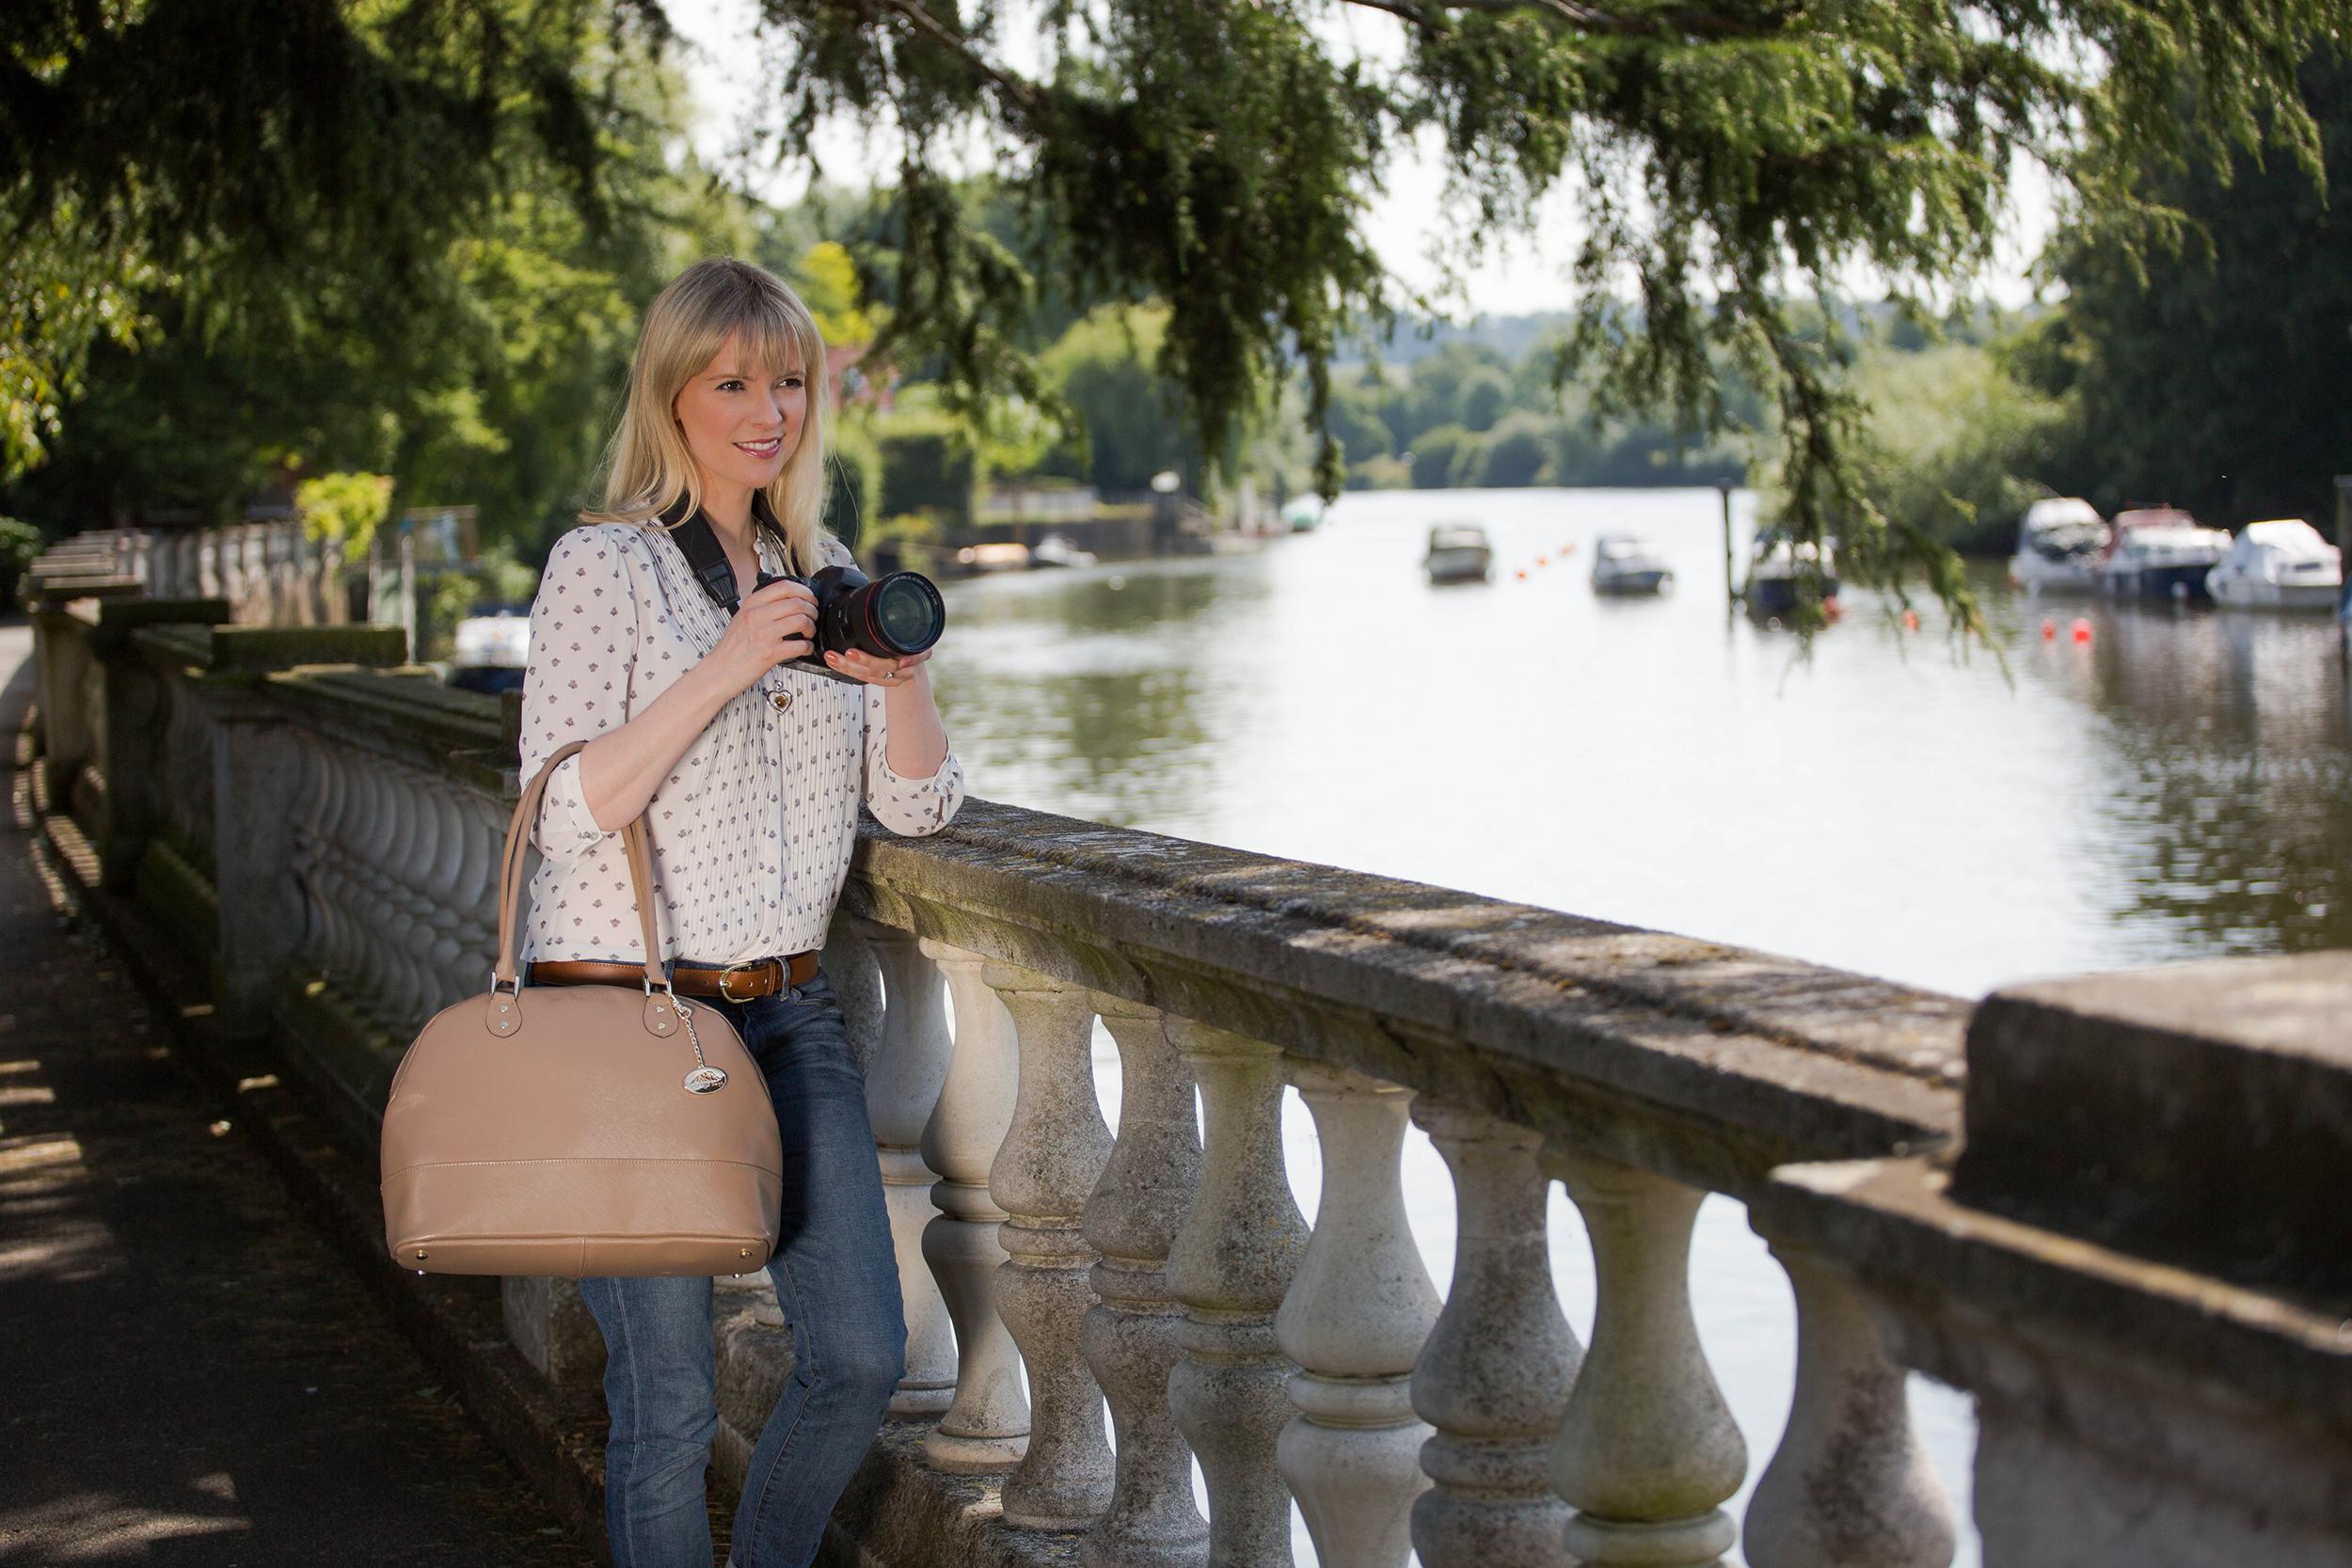 London Product Photographer Location Shoot